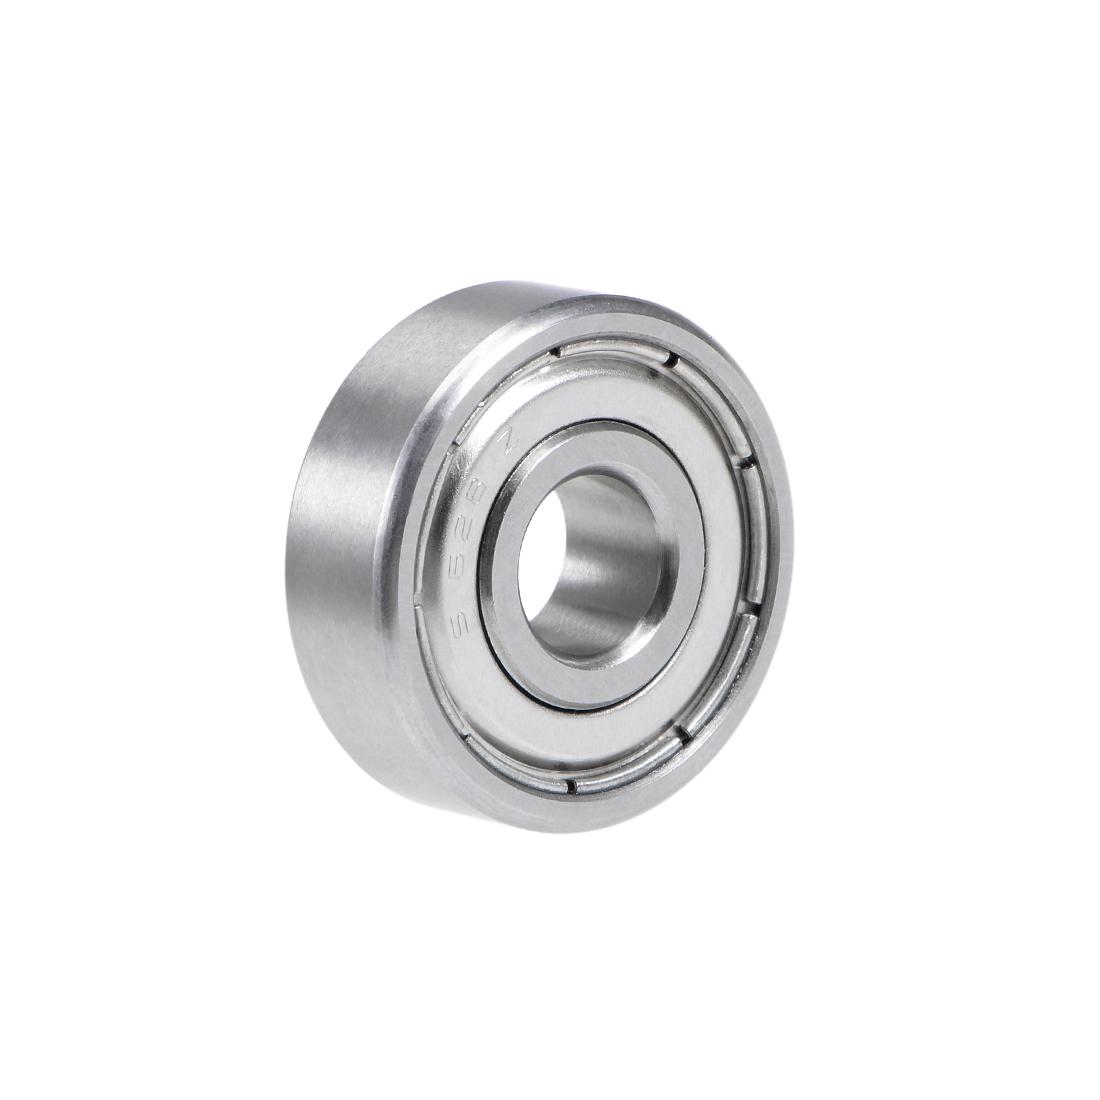 S628ZZ Stainless Steel Ball Bearing 8x24x8mm Double Shielded 628Z Bearings